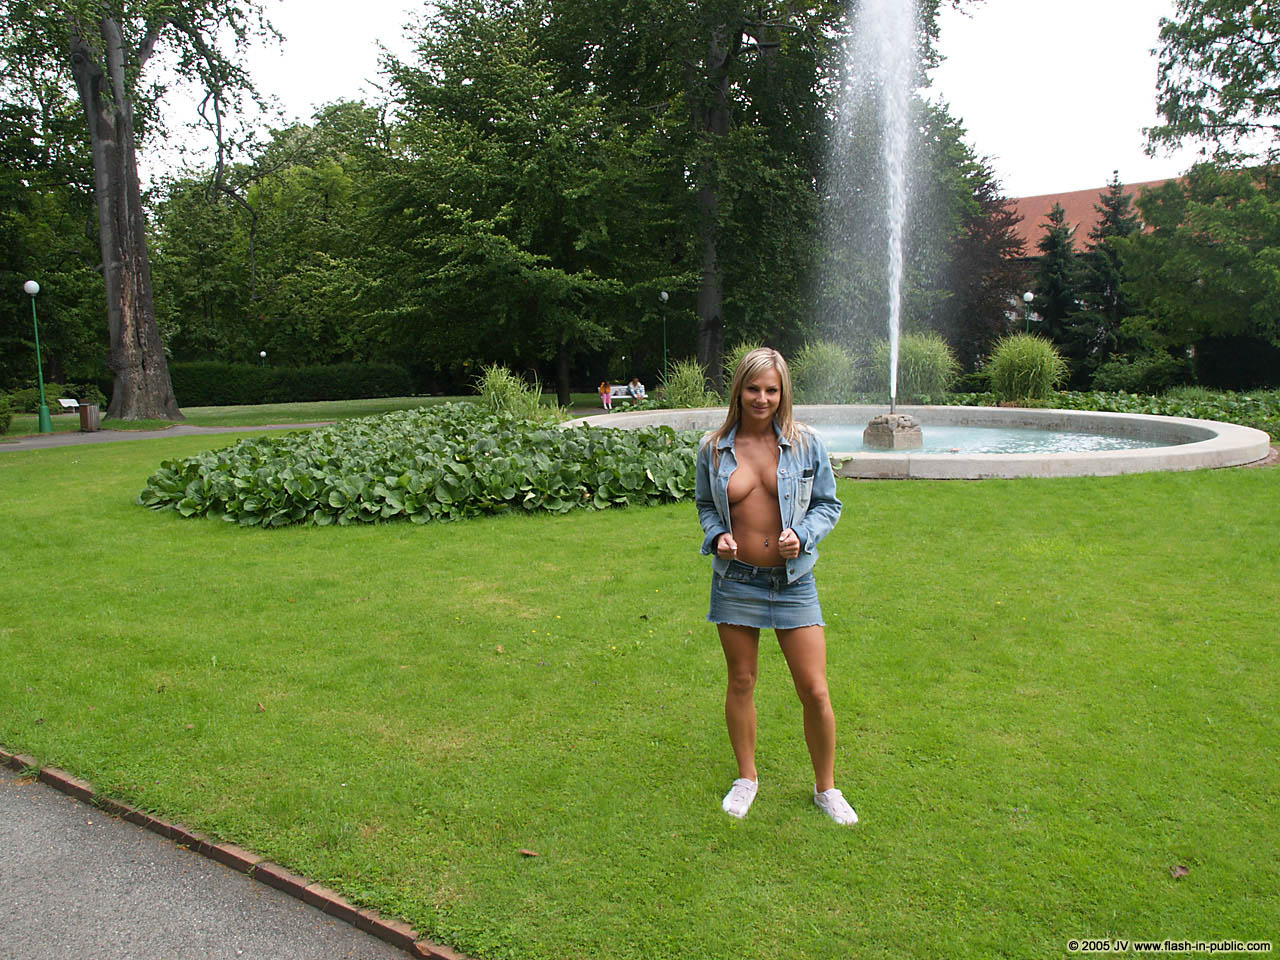 vendula-bednarova-jeans-miniskirt-flash-in-public-07